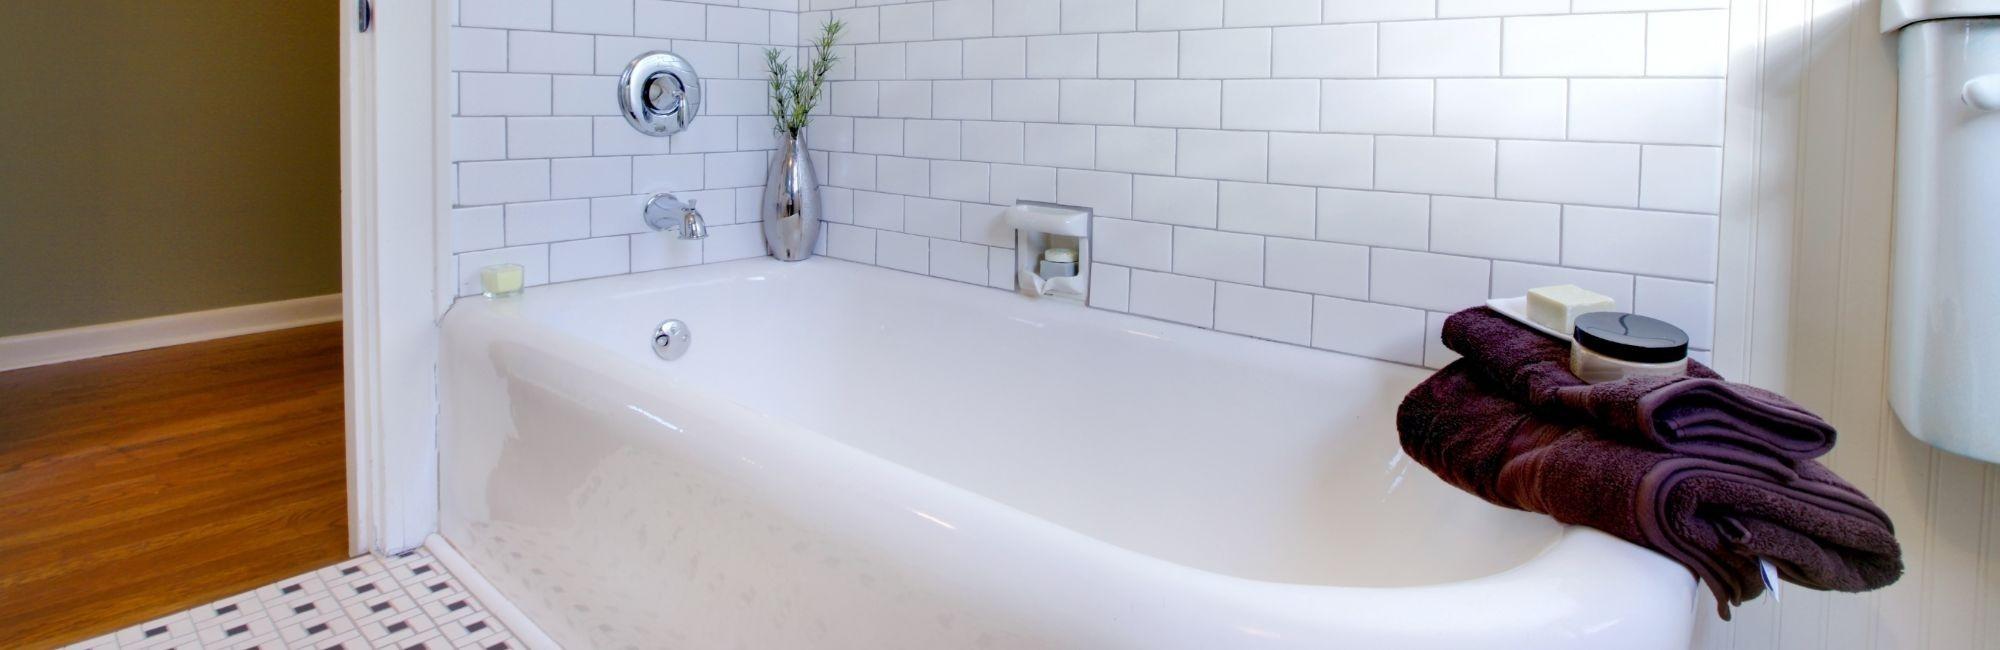 5 Top Tips For Choosing The Best Bathtub Refinishing Company